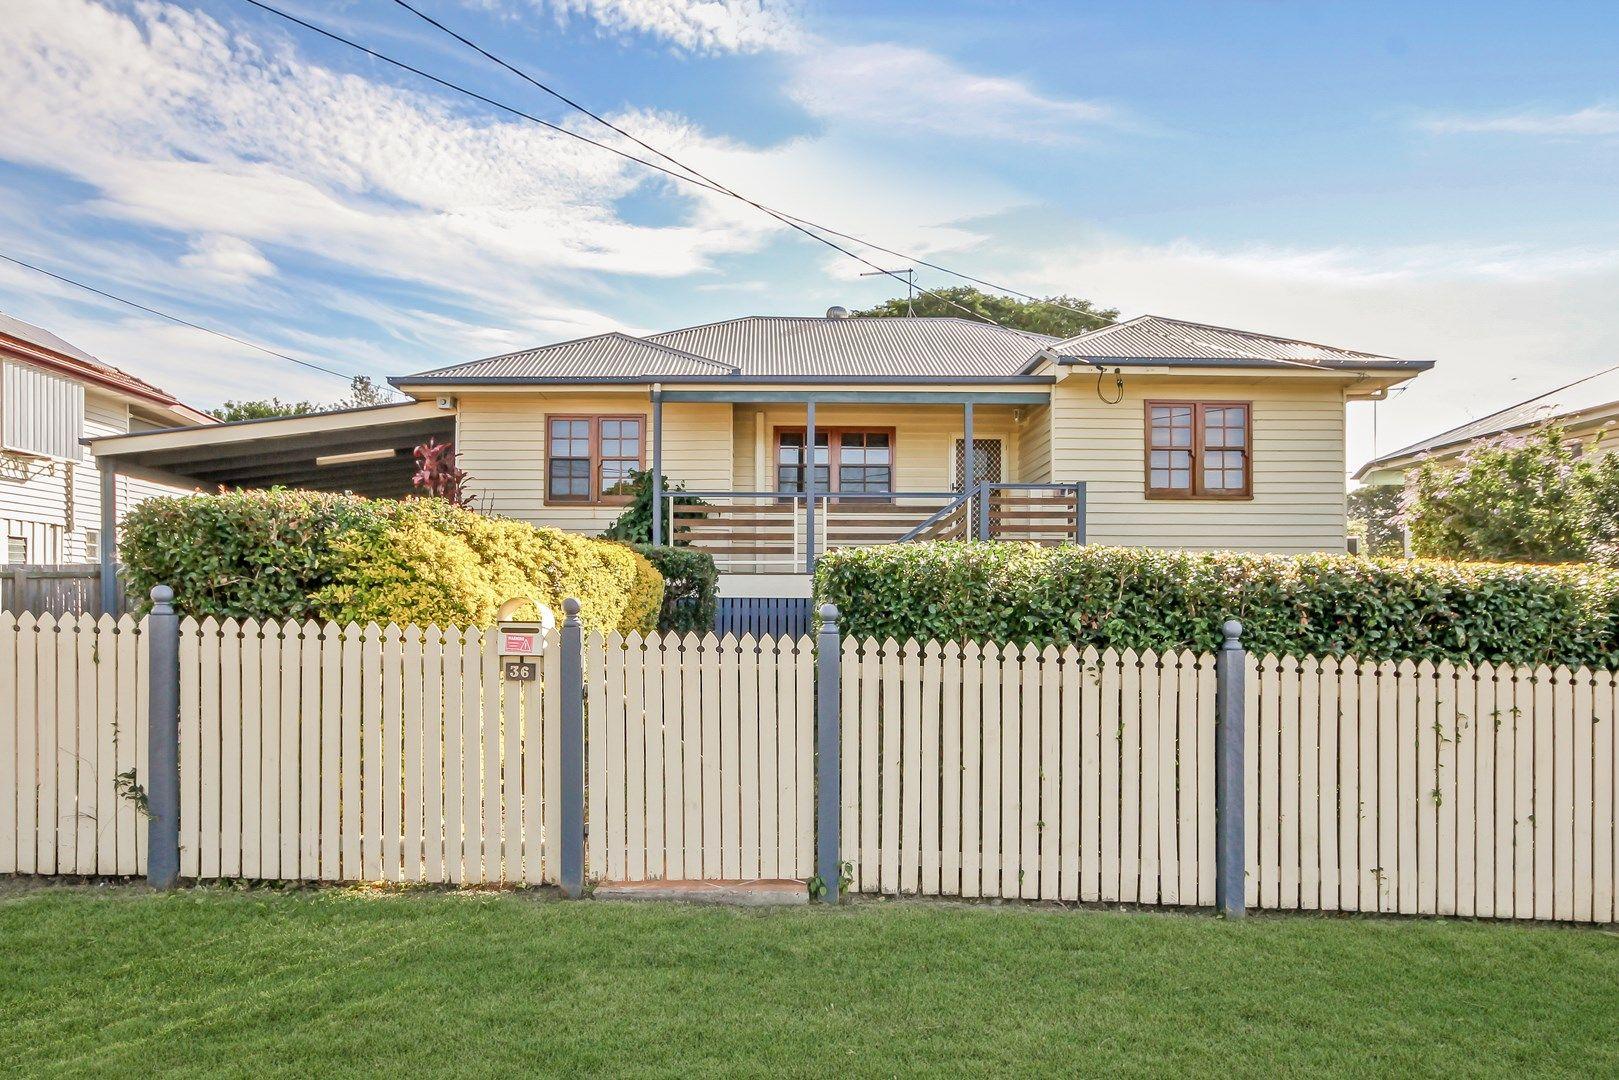 36 Adair Street, Bald Hills QLD 4036, Image 0